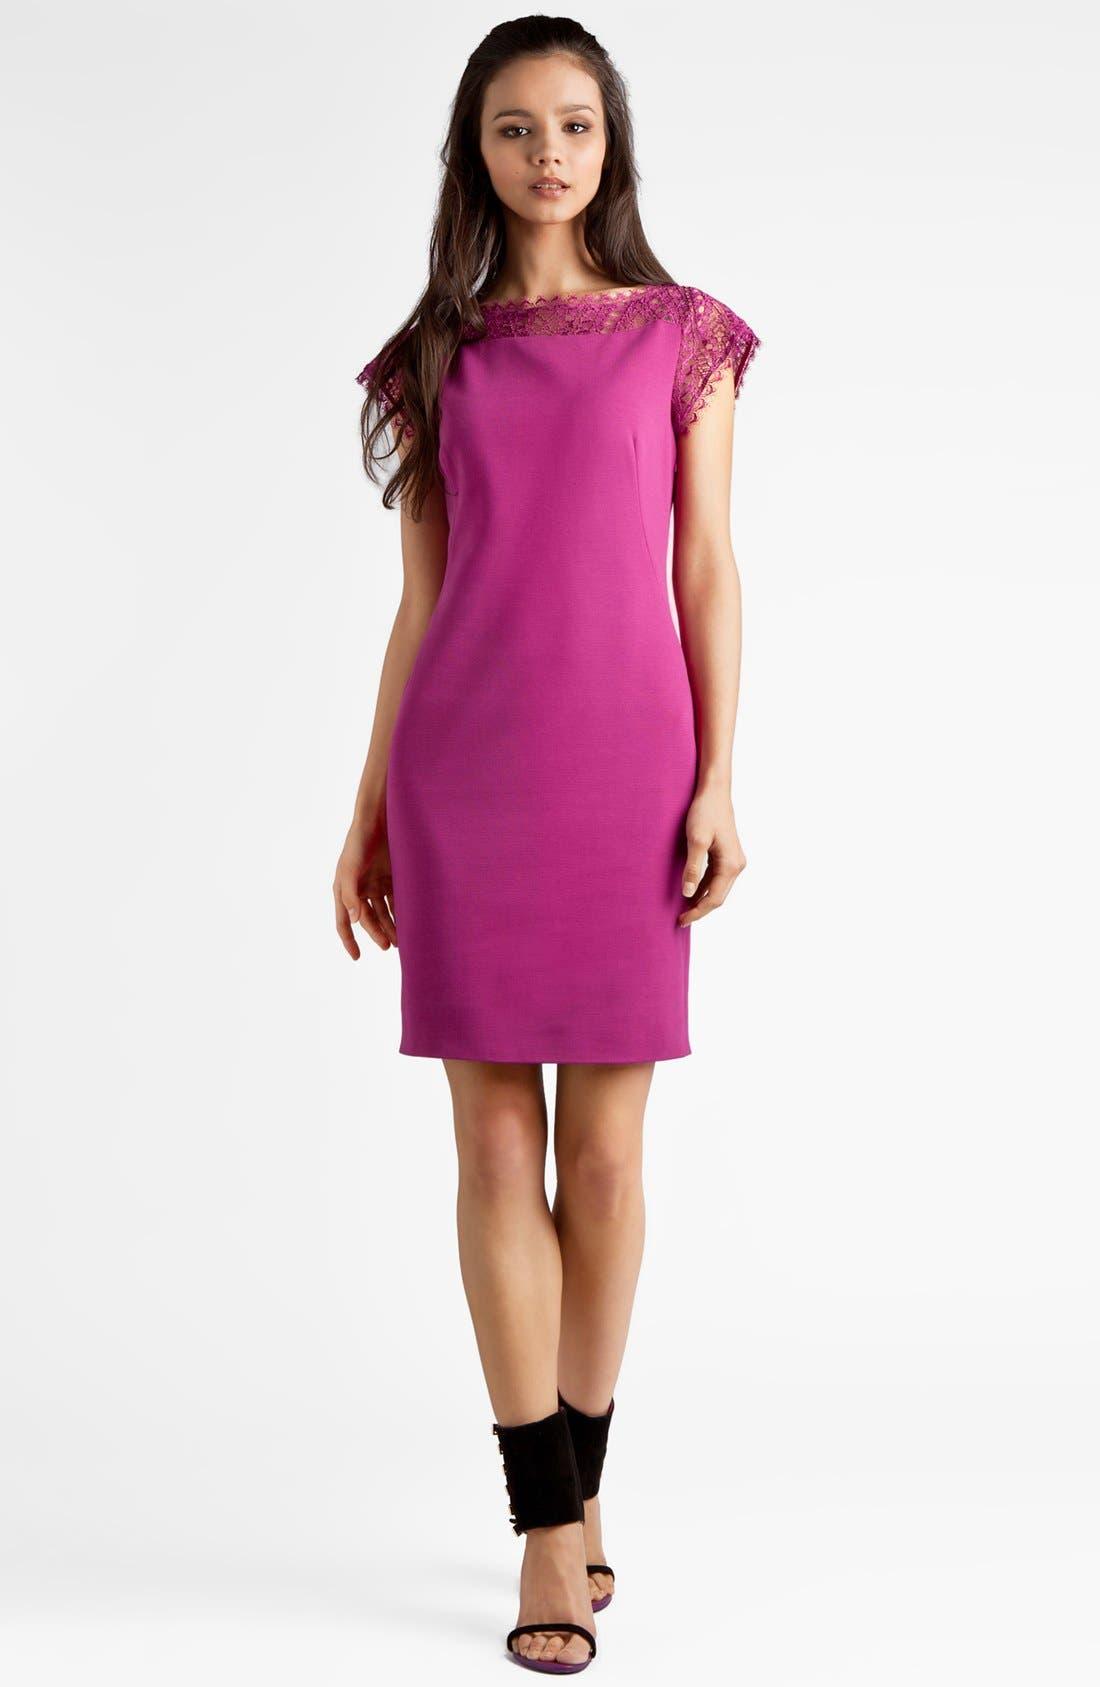 Alternate Image 1 Selected - Emilio Pucci Lace Detail Punto Milano Dress